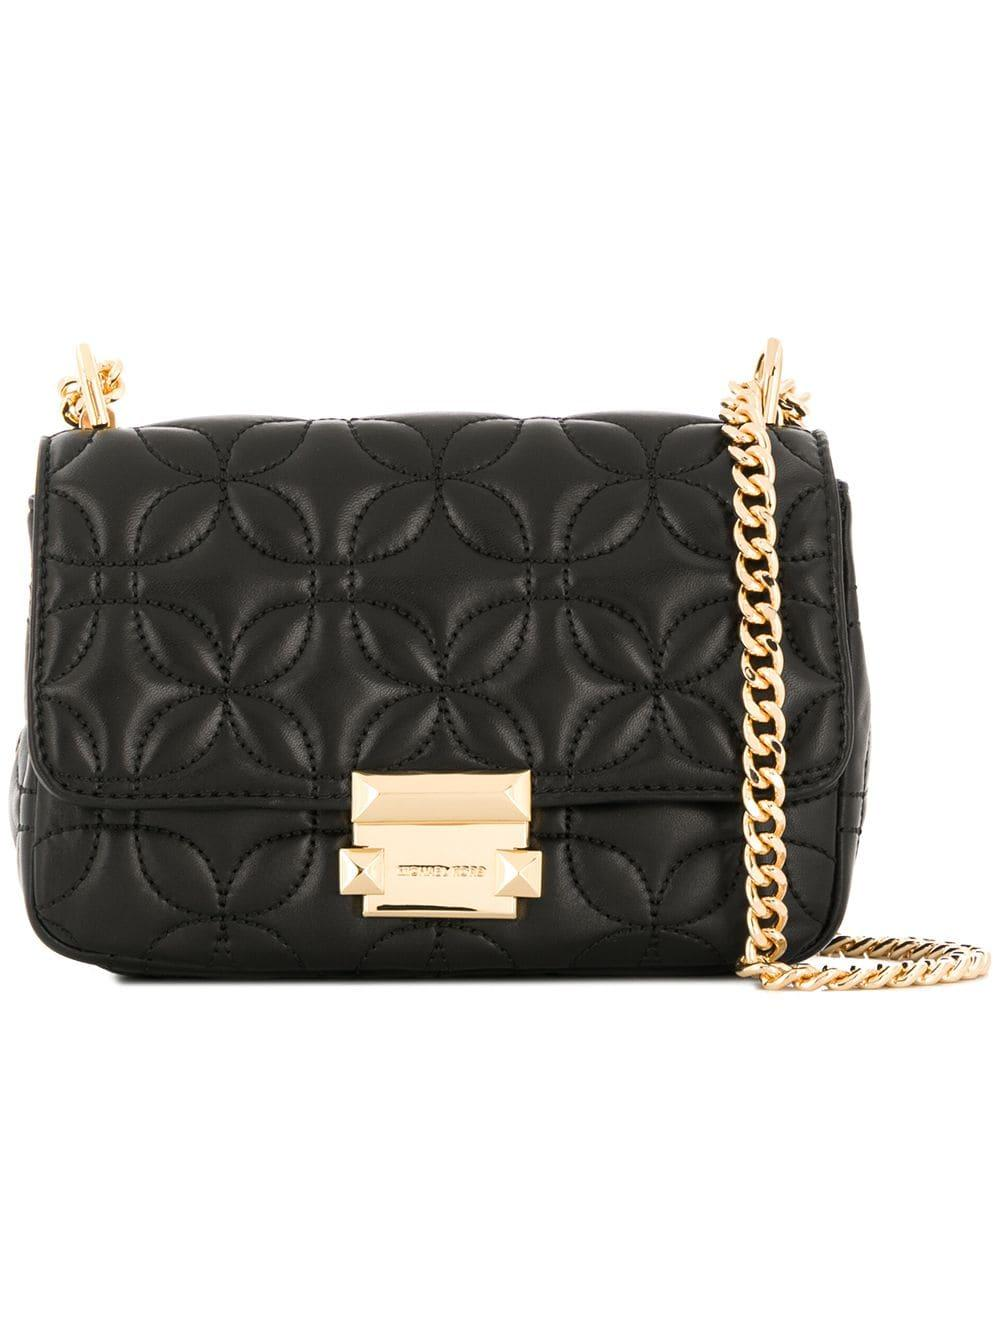 a84c61ad45fa Lyst - MICHAEL Michael Kors Sloan Leather Shoulder Bag in Black